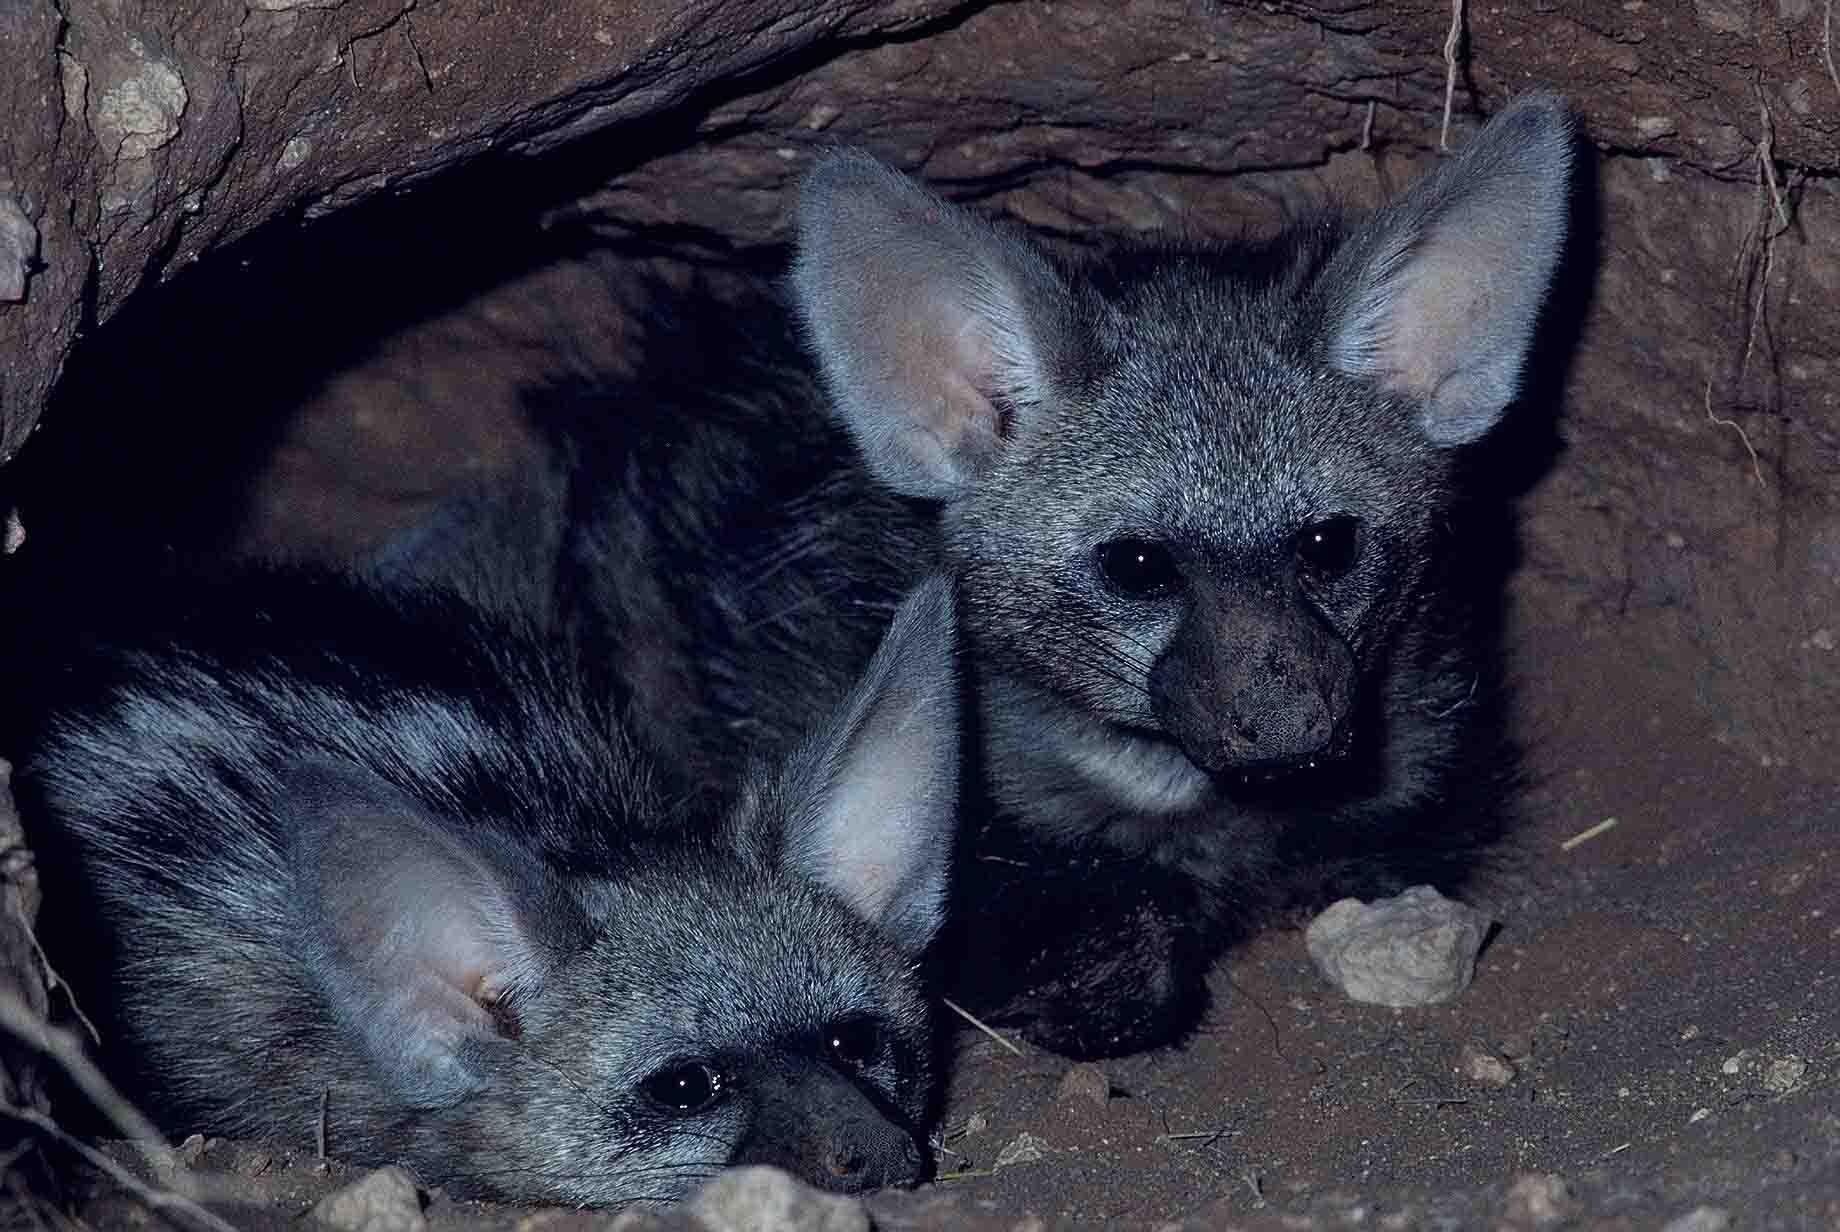 Baby aardwolf photos